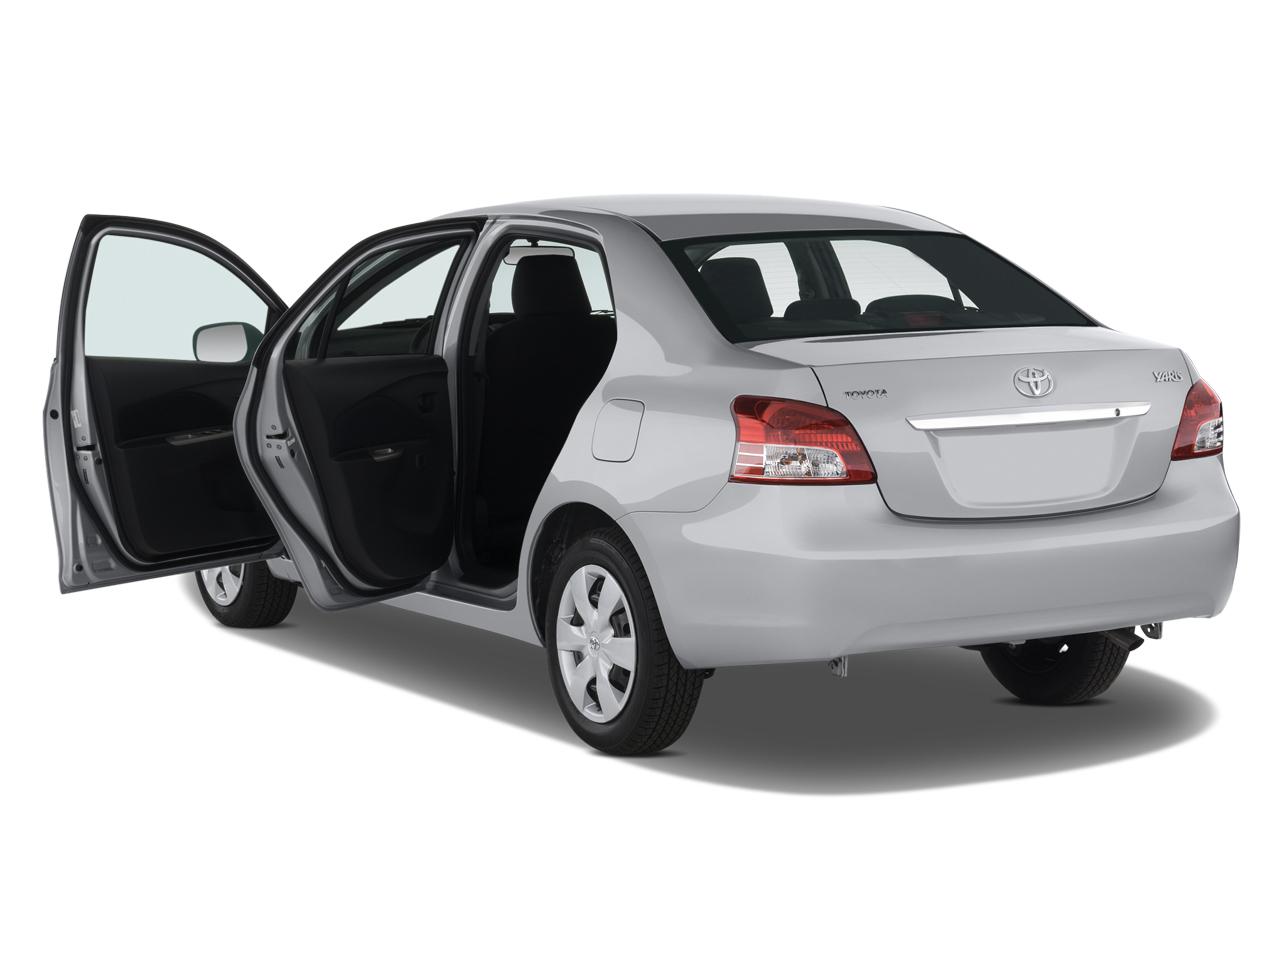 2008 toyota yaris toyota compact sedan review automobile magazine. Black Bedroom Furniture Sets. Home Design Ideas